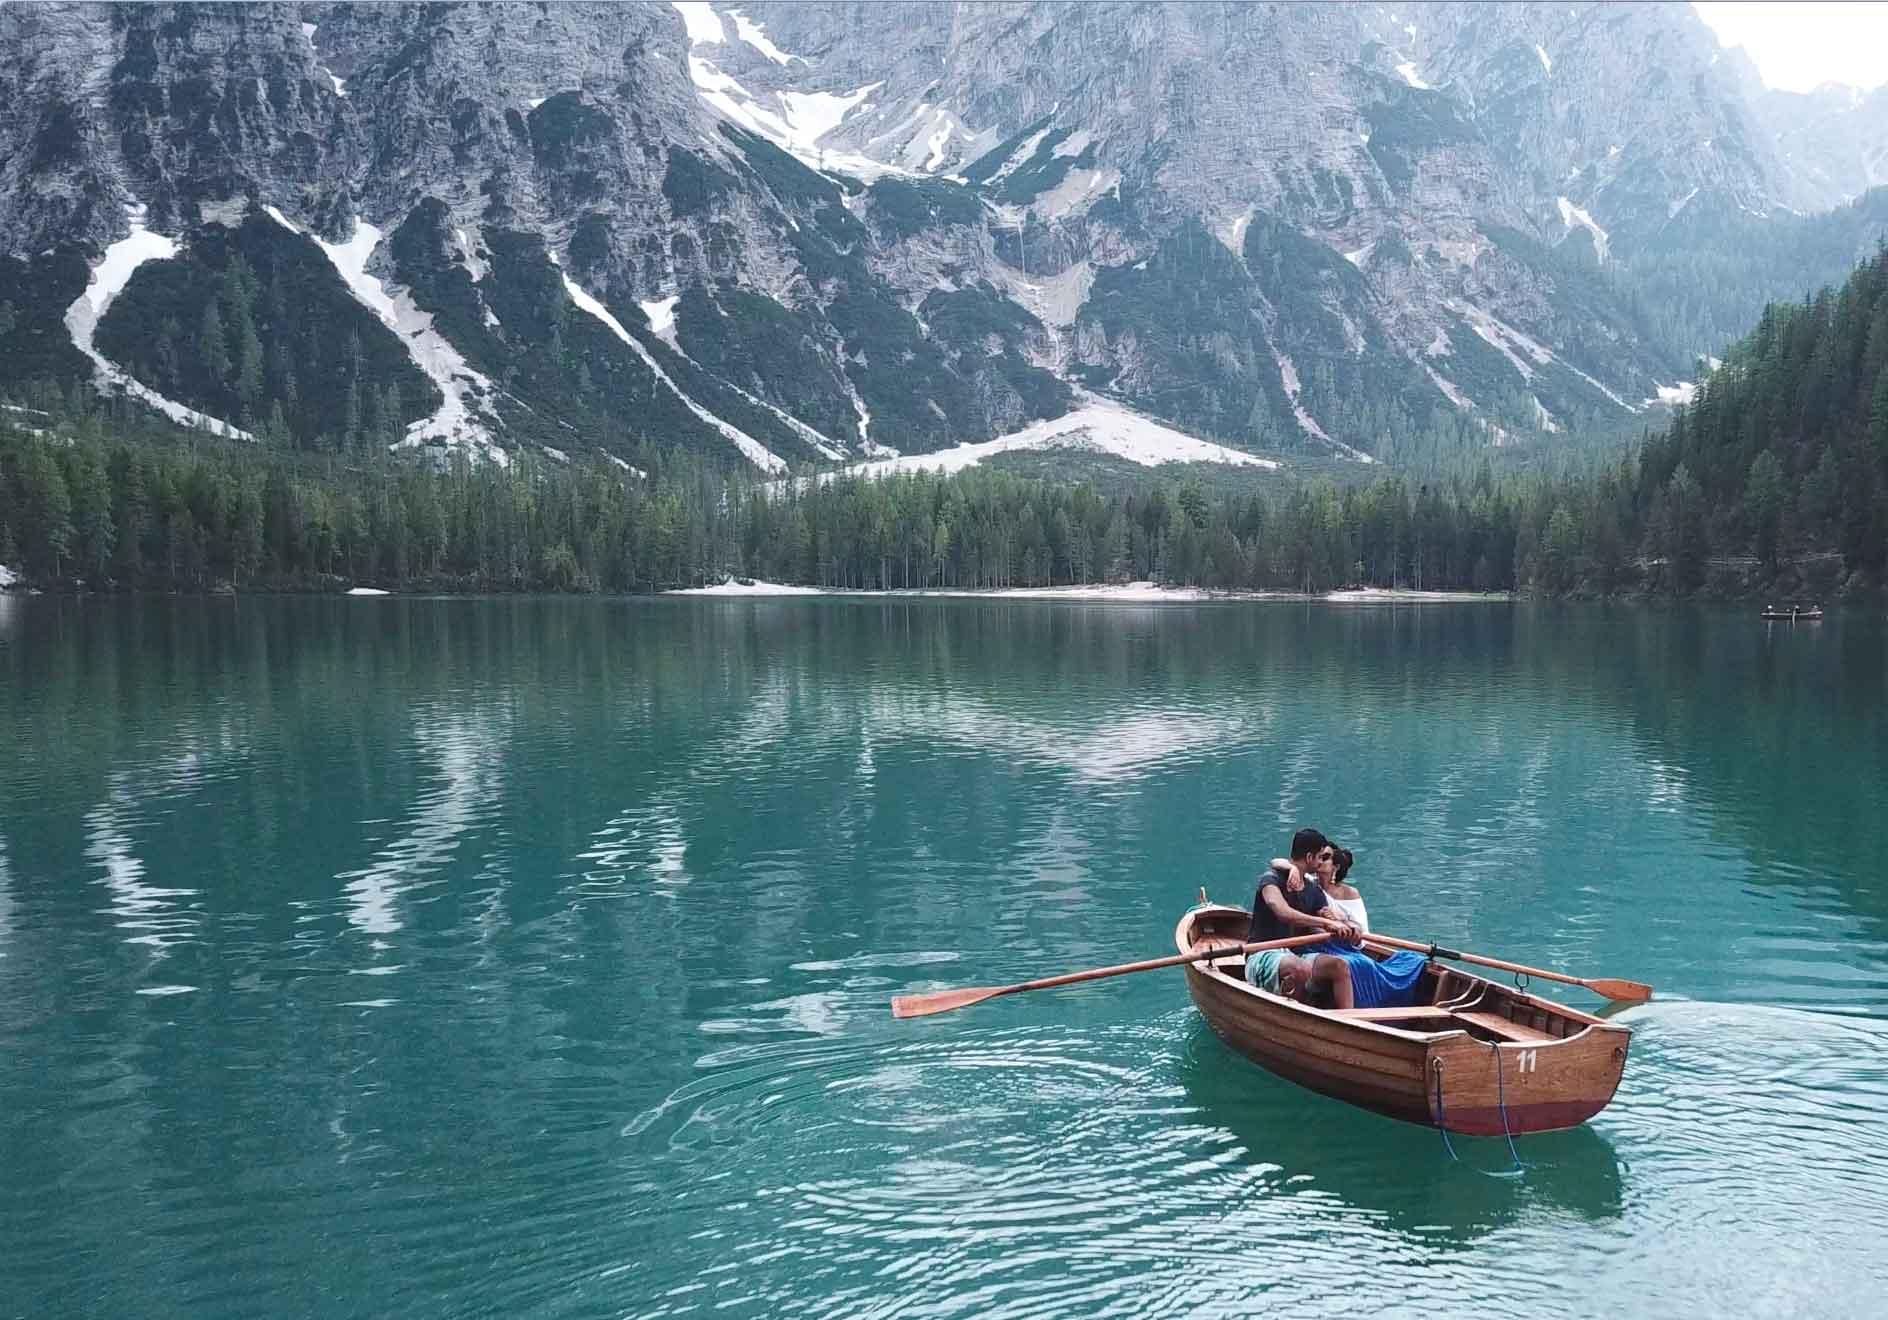 Canoeing with the HUBS on Lago di Braies (Pragser Wildsee)